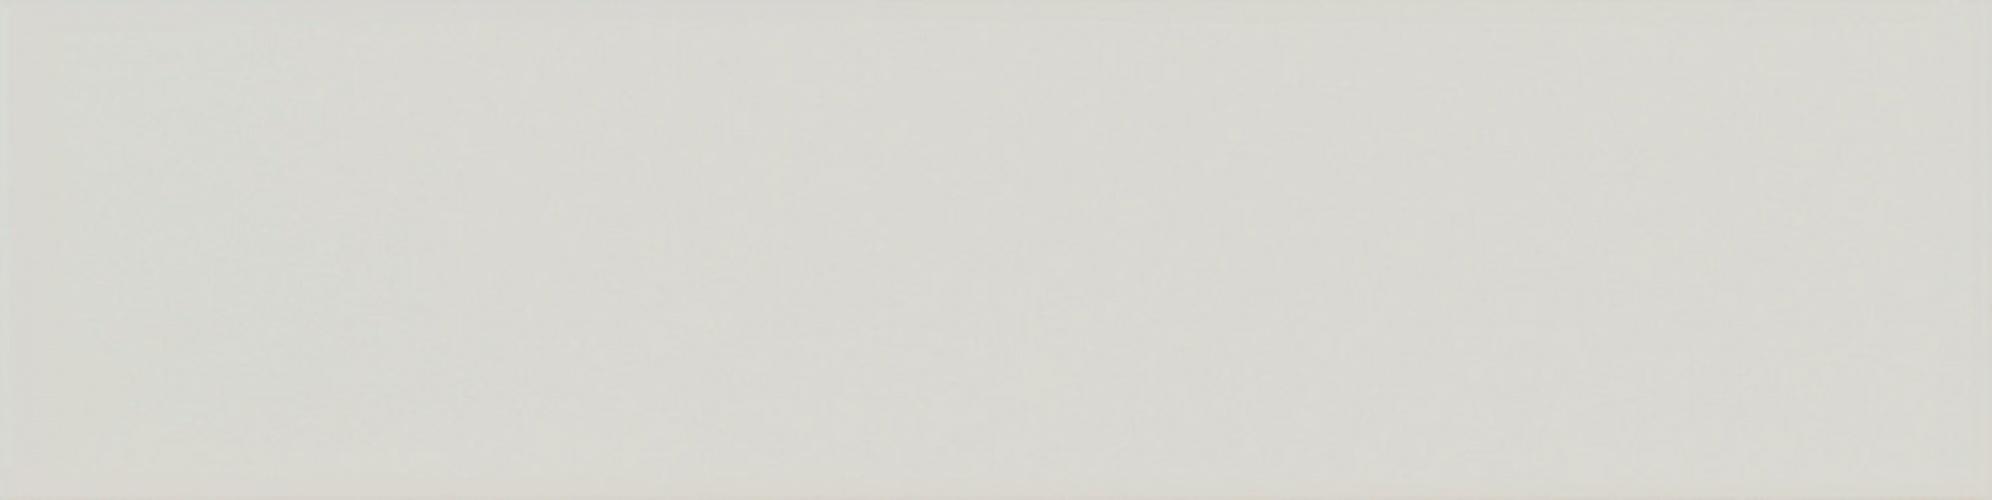 Настенная плитка Light Grey Brillo 100x400 / 7mm